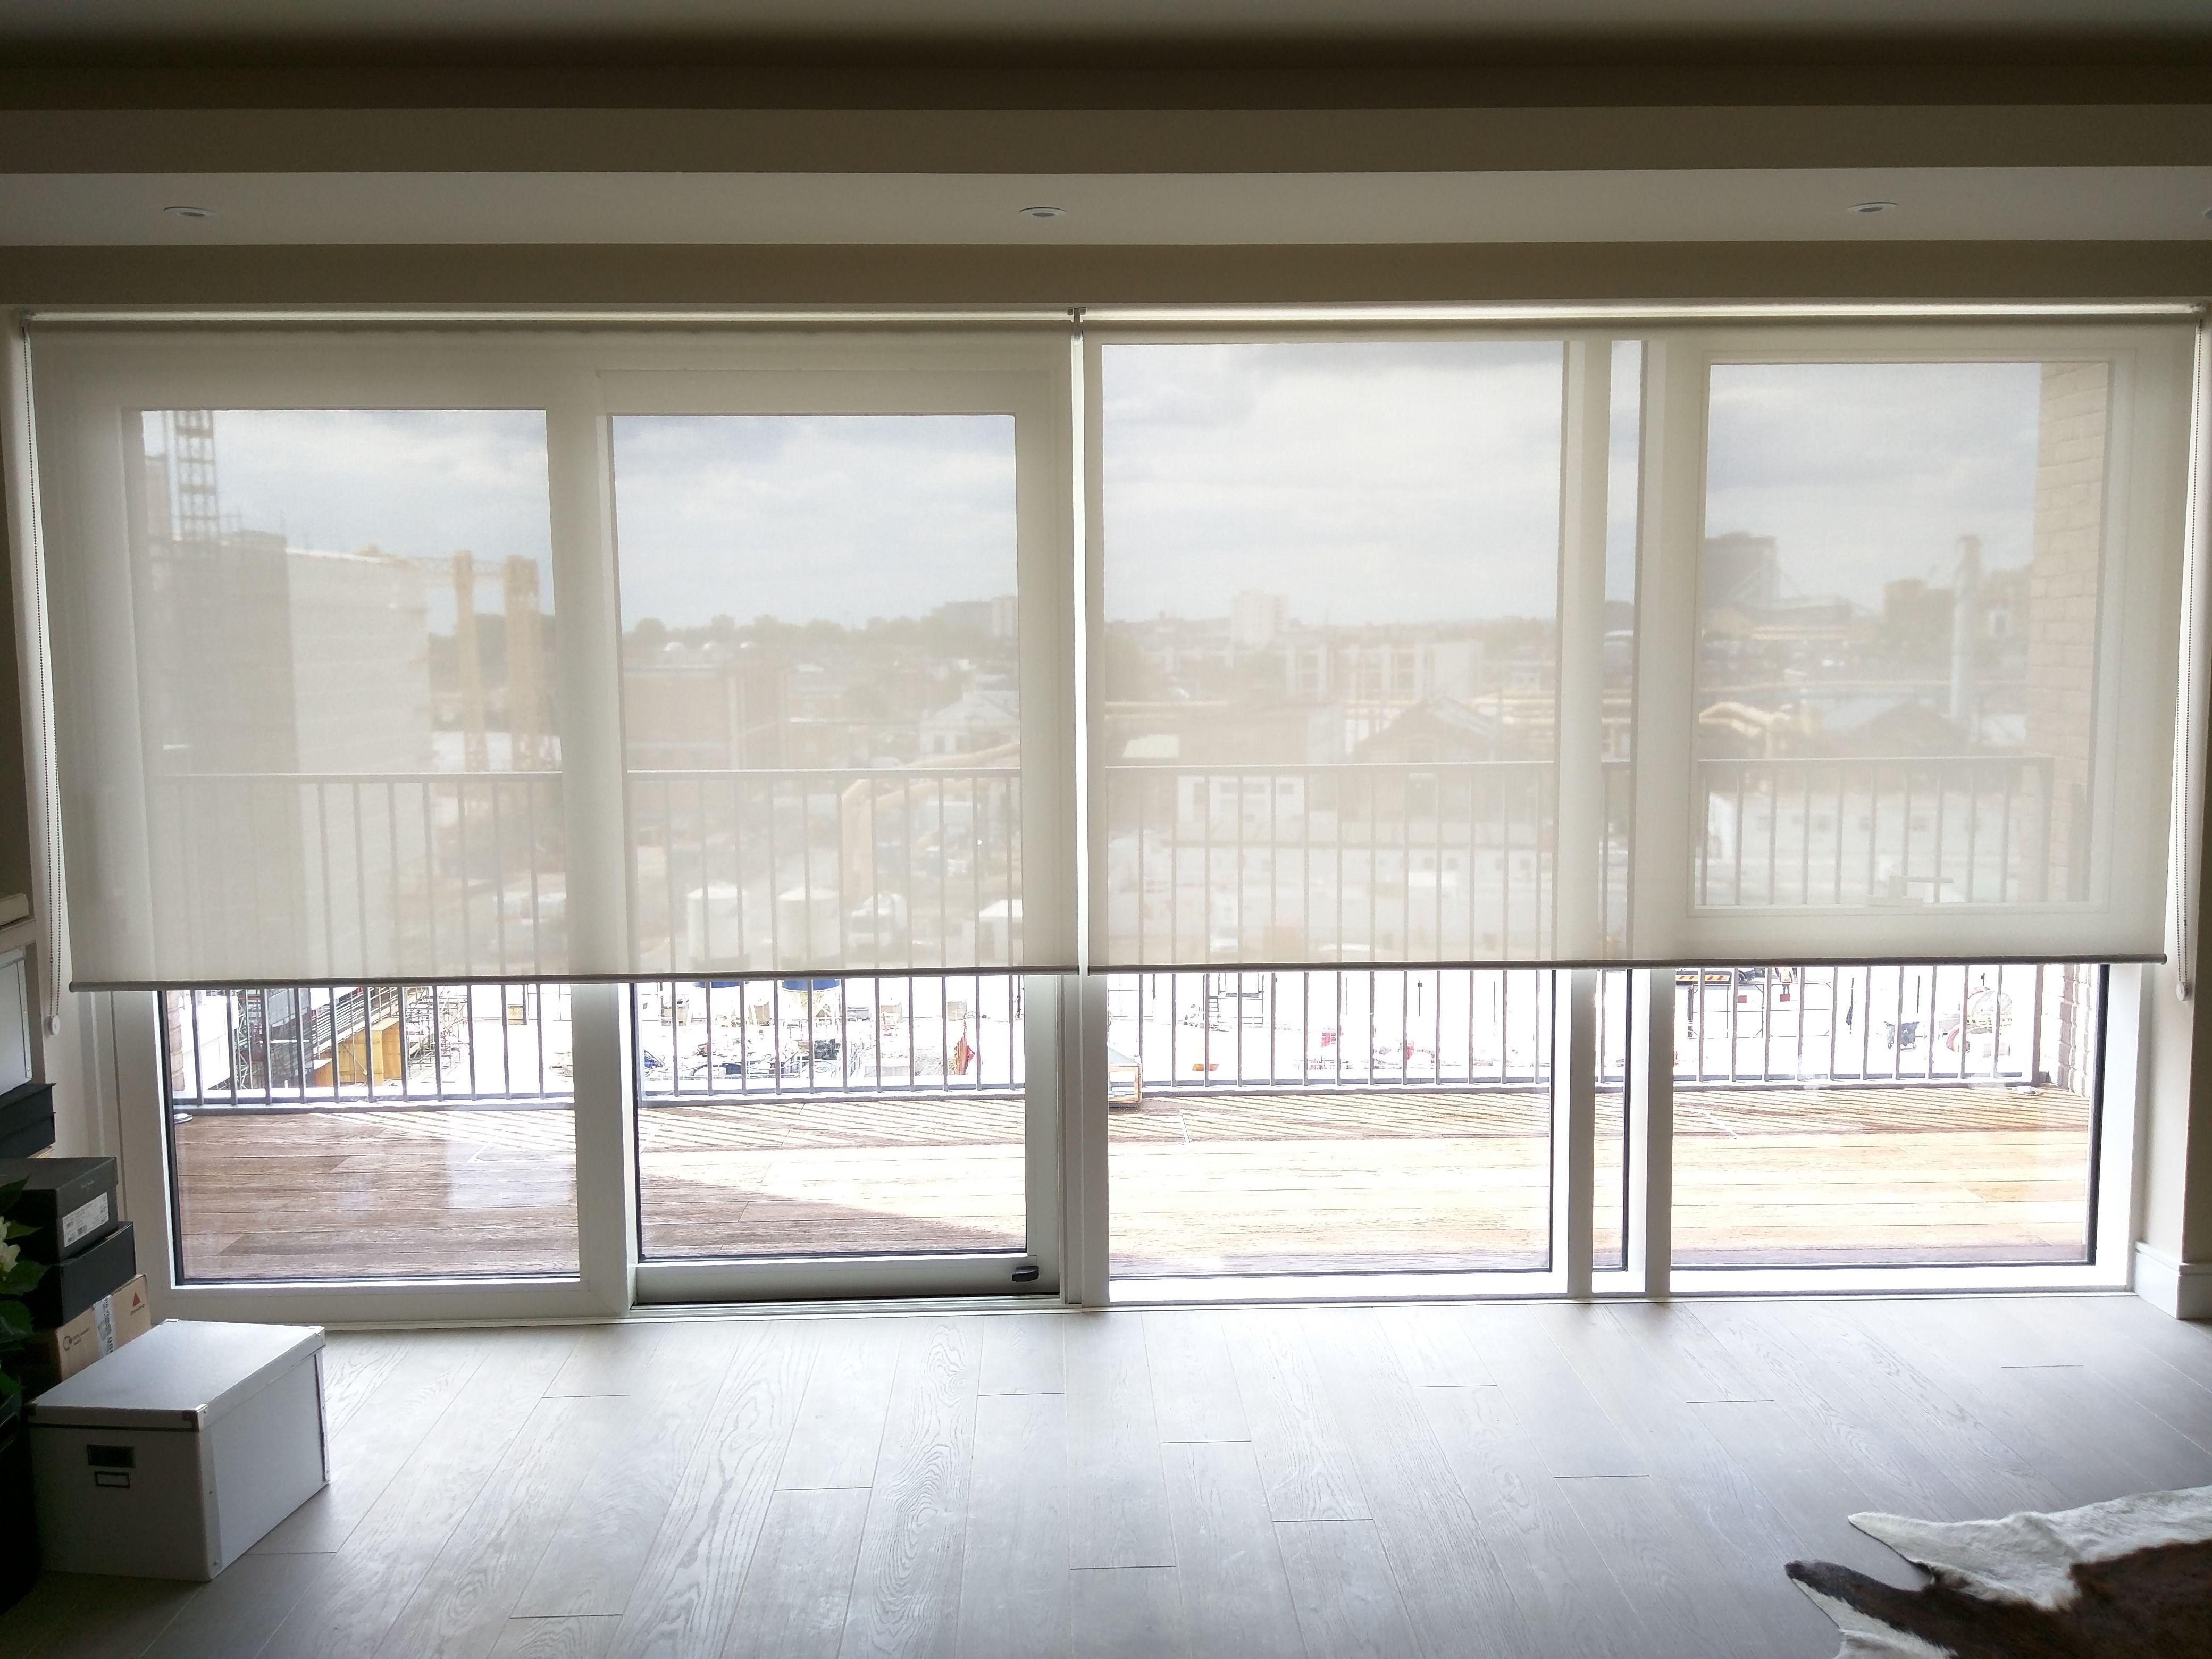 Sunscreen Roller Blinds Floor To Ceiling Windows Sliding Doors Lond Sliding Glass Door Window Sliding Doors Interior Sliding Glass Door Window Treatments